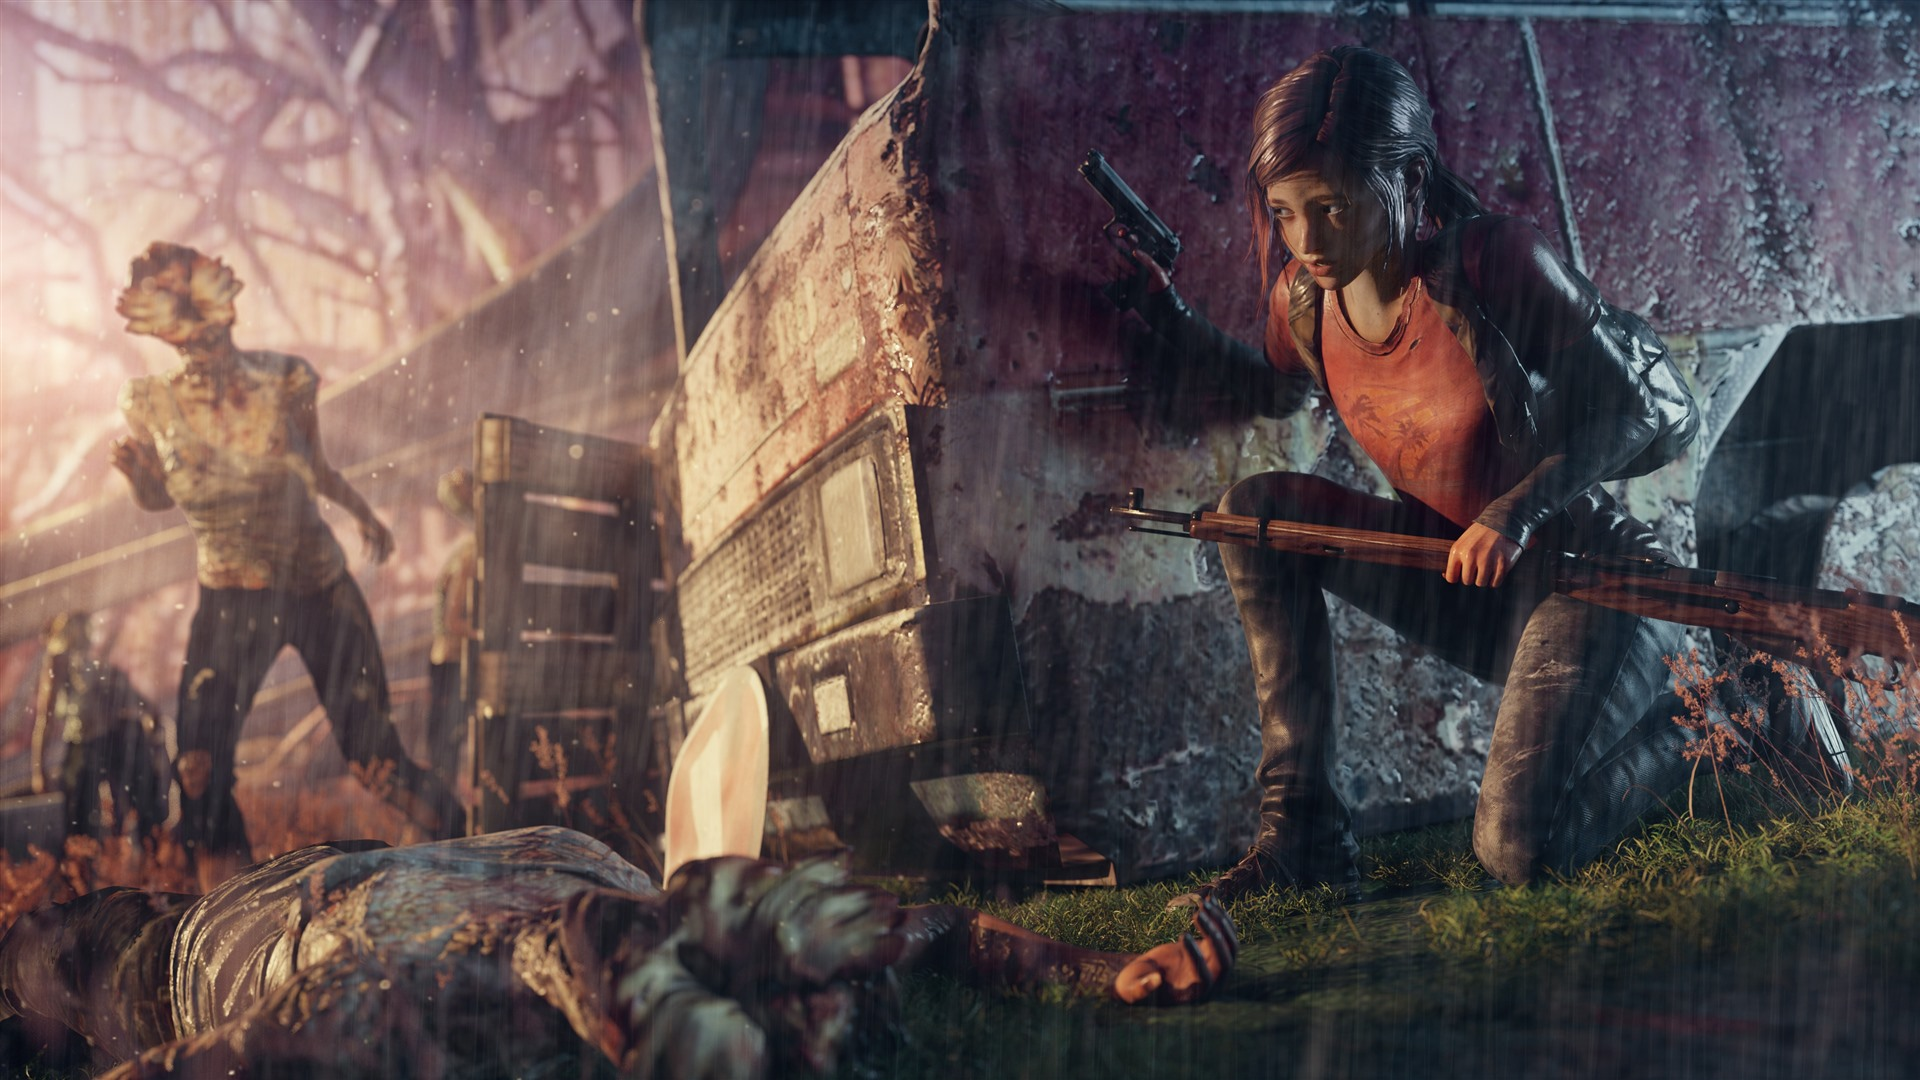 Wallpaper The Last Of Us Girl Rain 3840x2160 Uhd 4k Picture Image